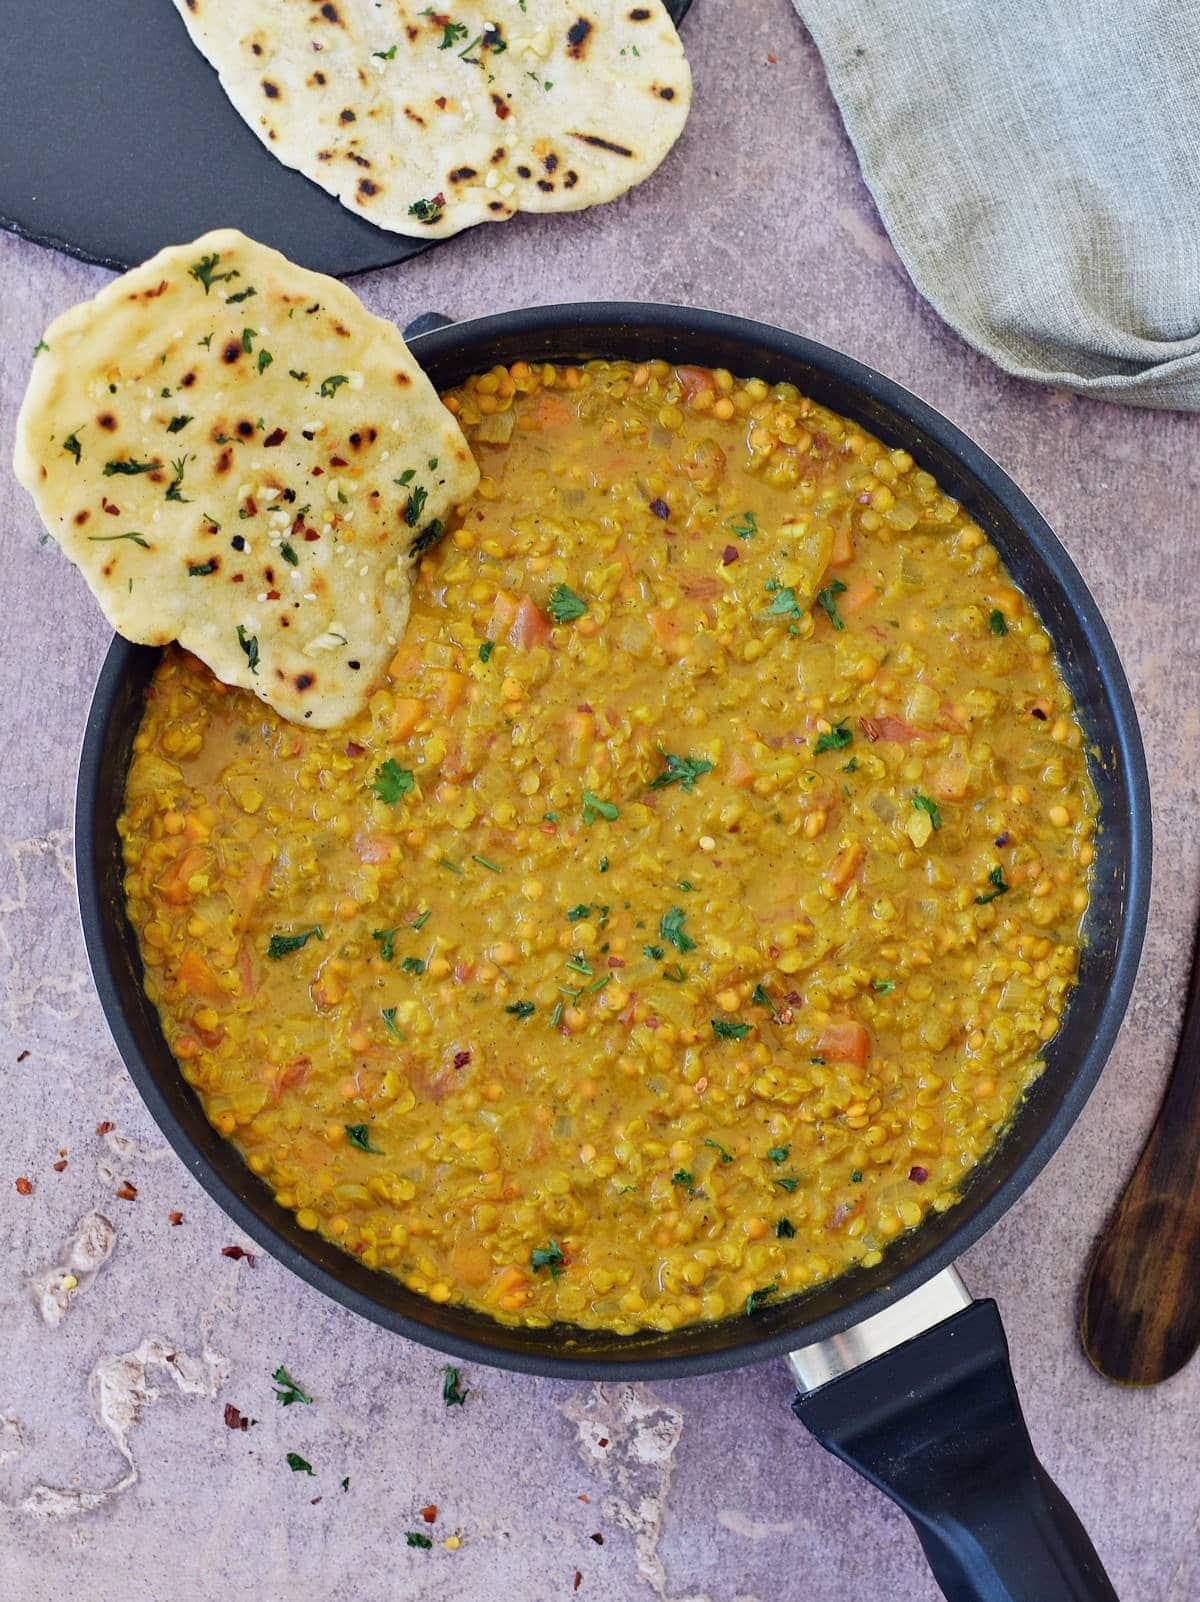 A piece of gluten-free Indian flatbread submerged in red lentil dahl in black skillet